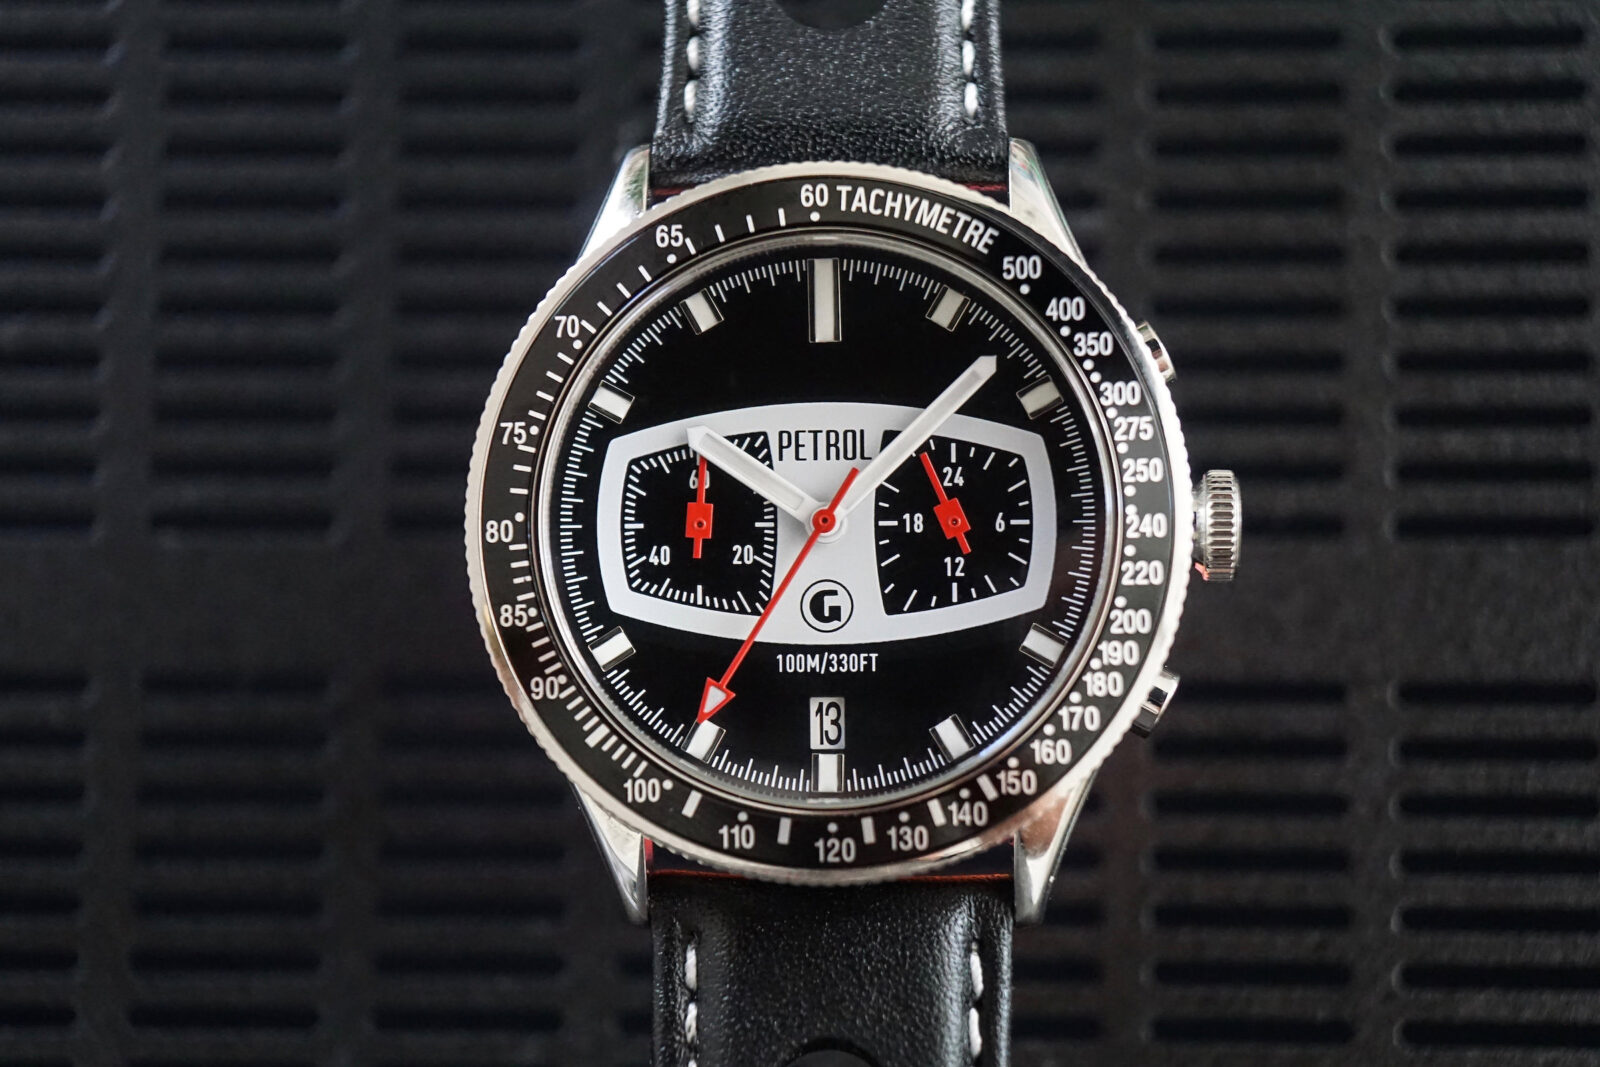 Goodspeed Petrol Racing Watch